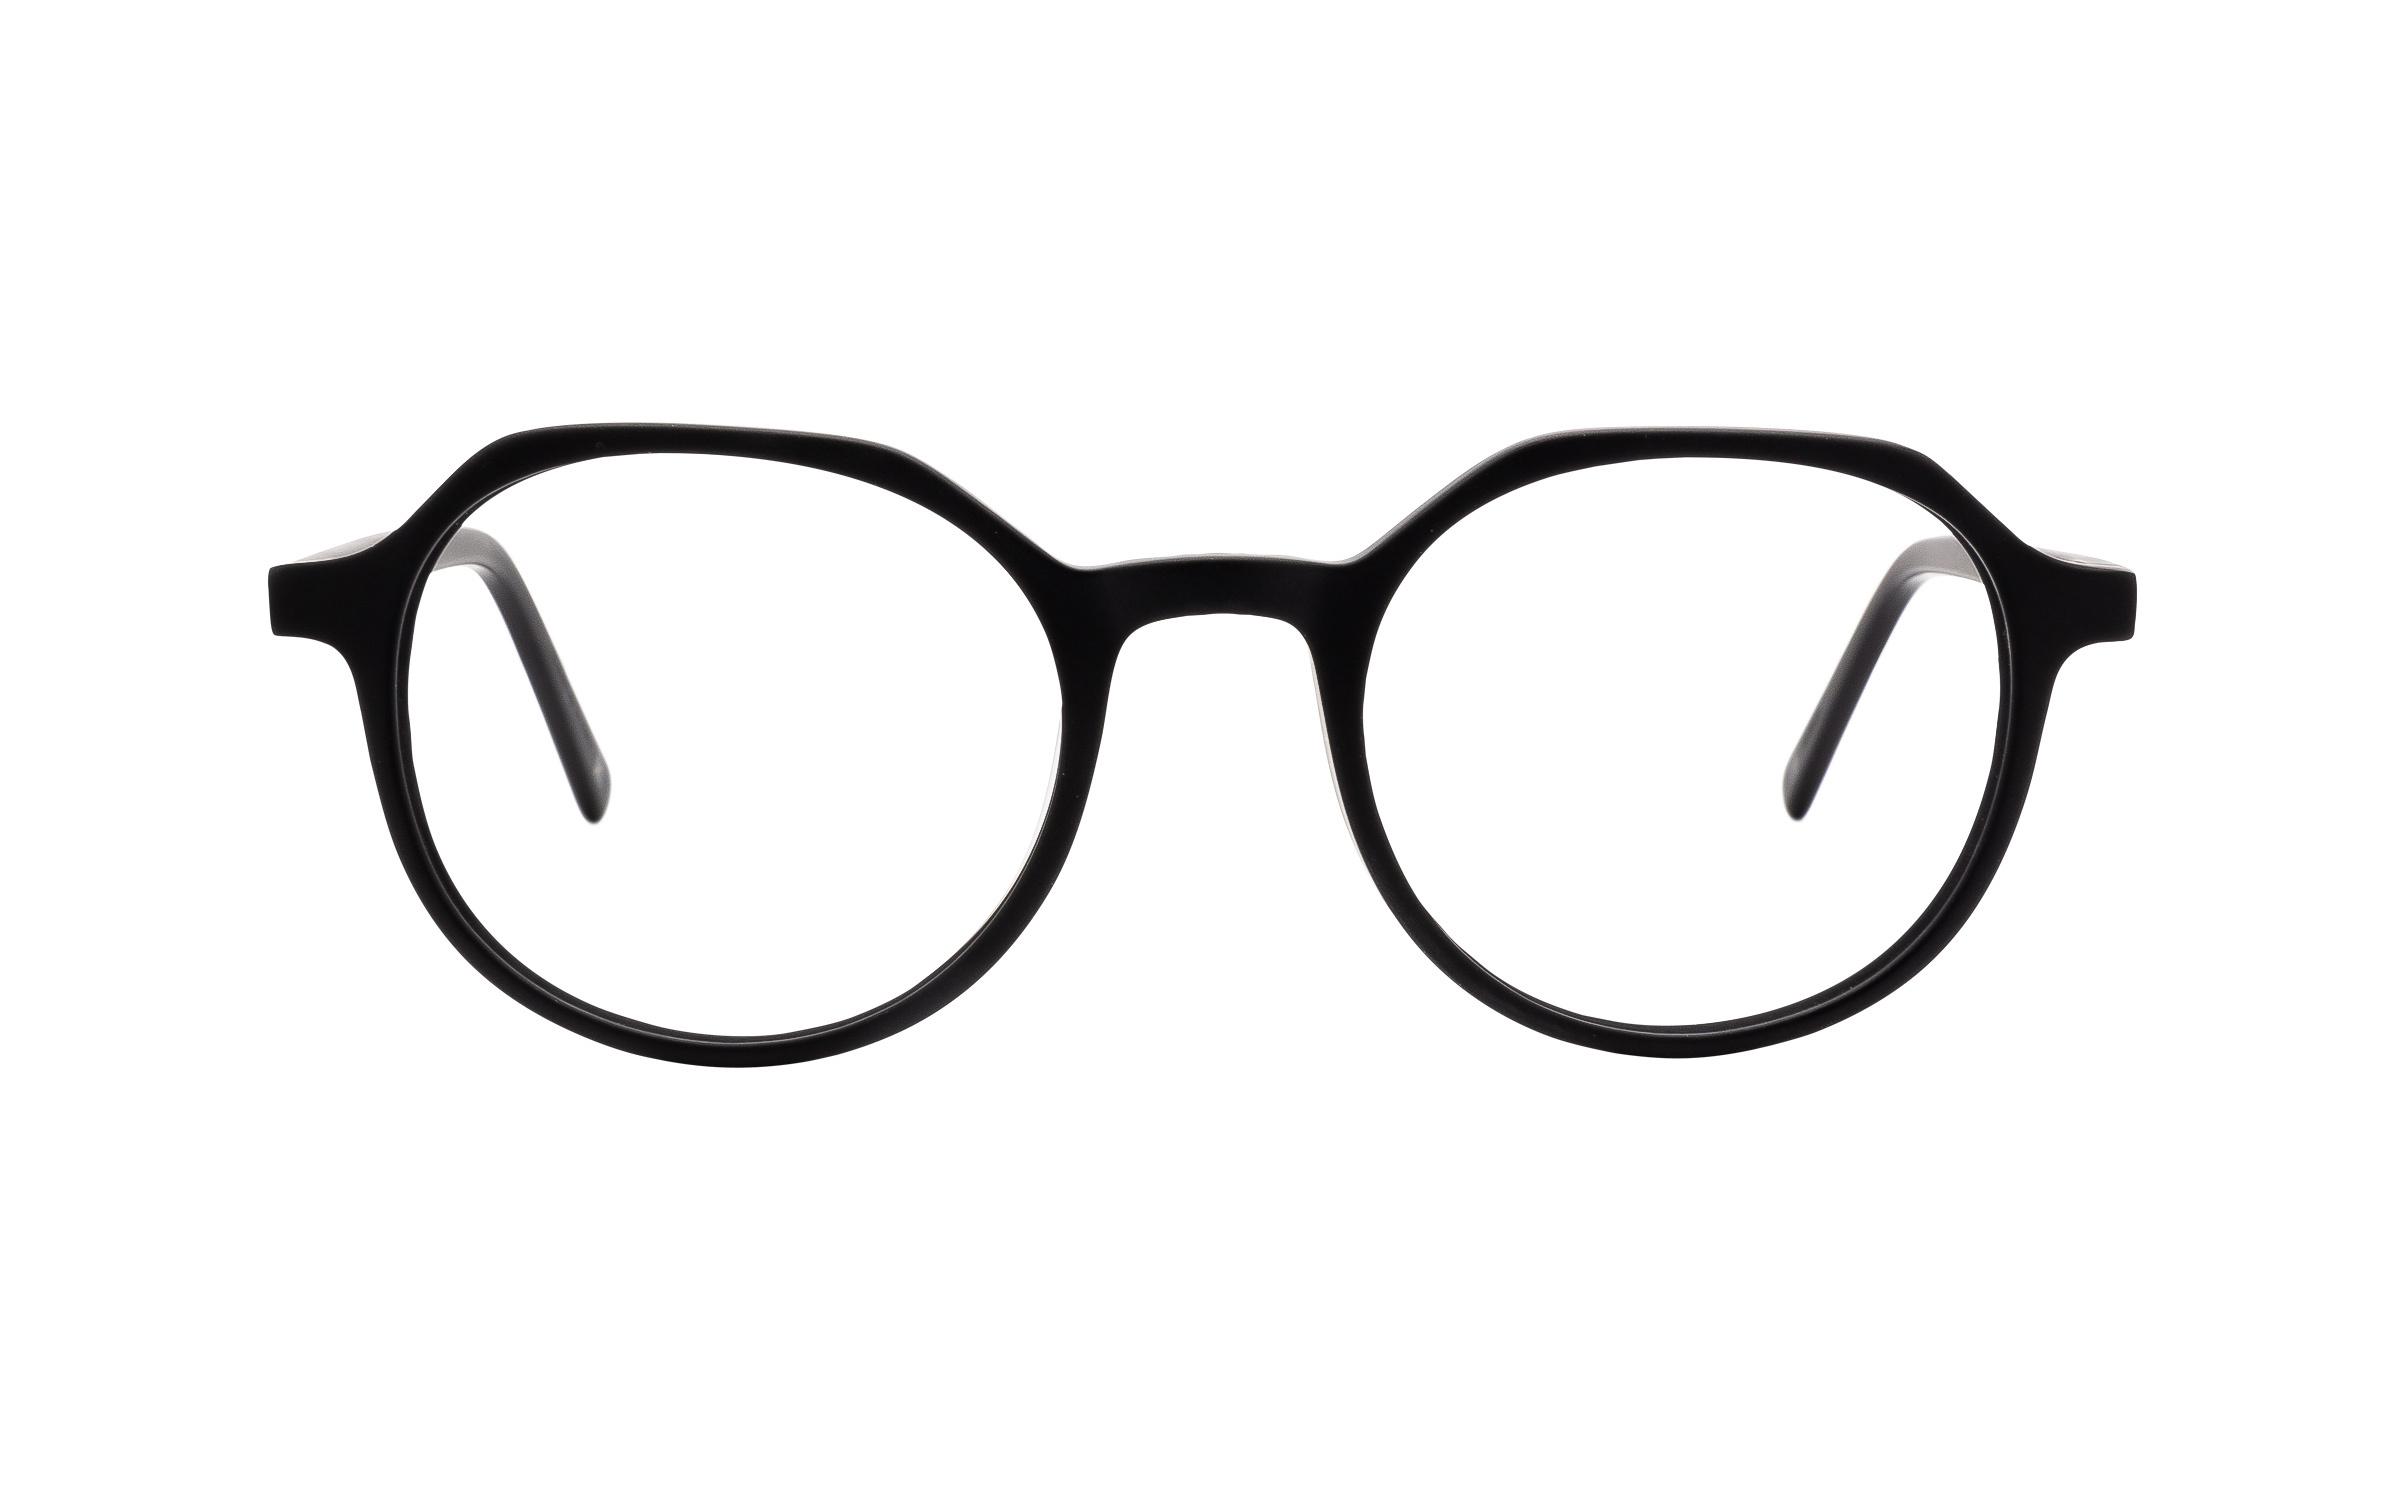 http://www.coastal.com/ - Derek Cardigan Atlas DC214 C02 (47) Eyeglasses and Frame in Matte Black – Online Coastal